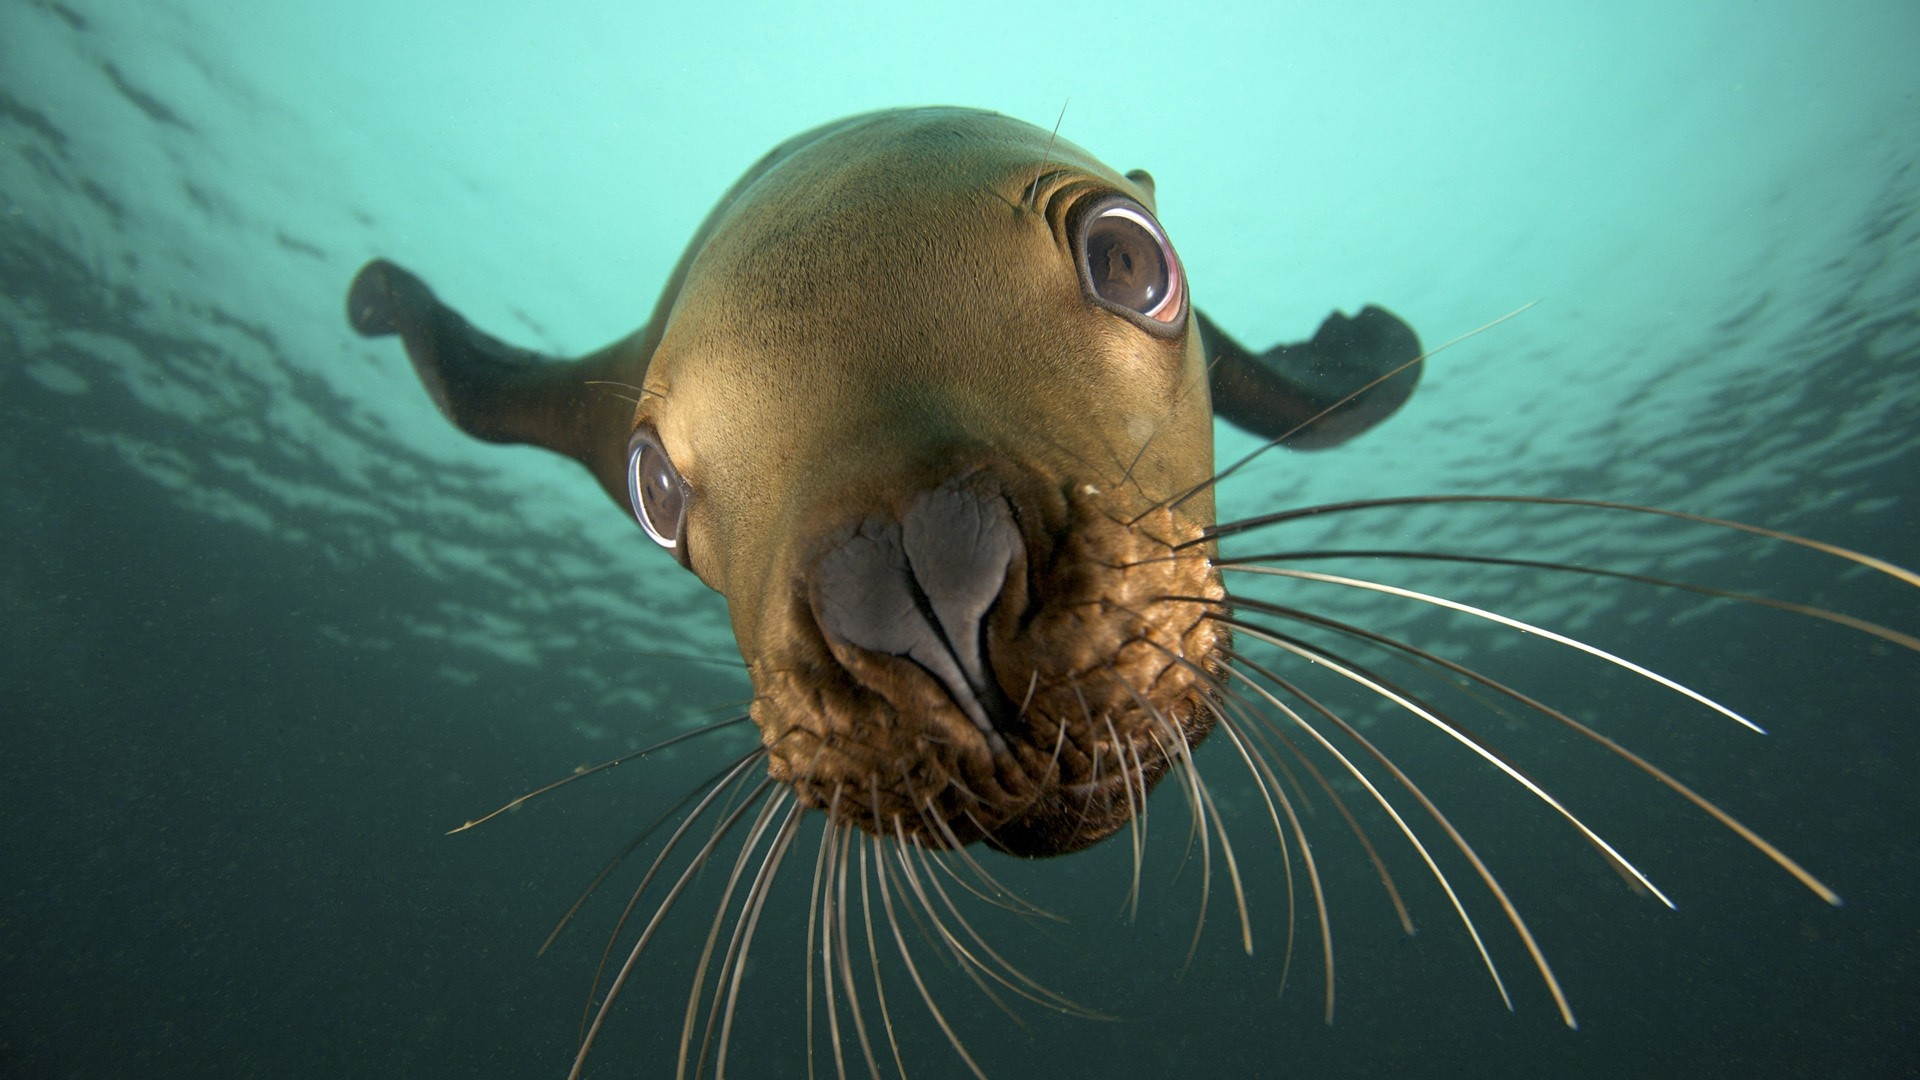 Seal High Quality